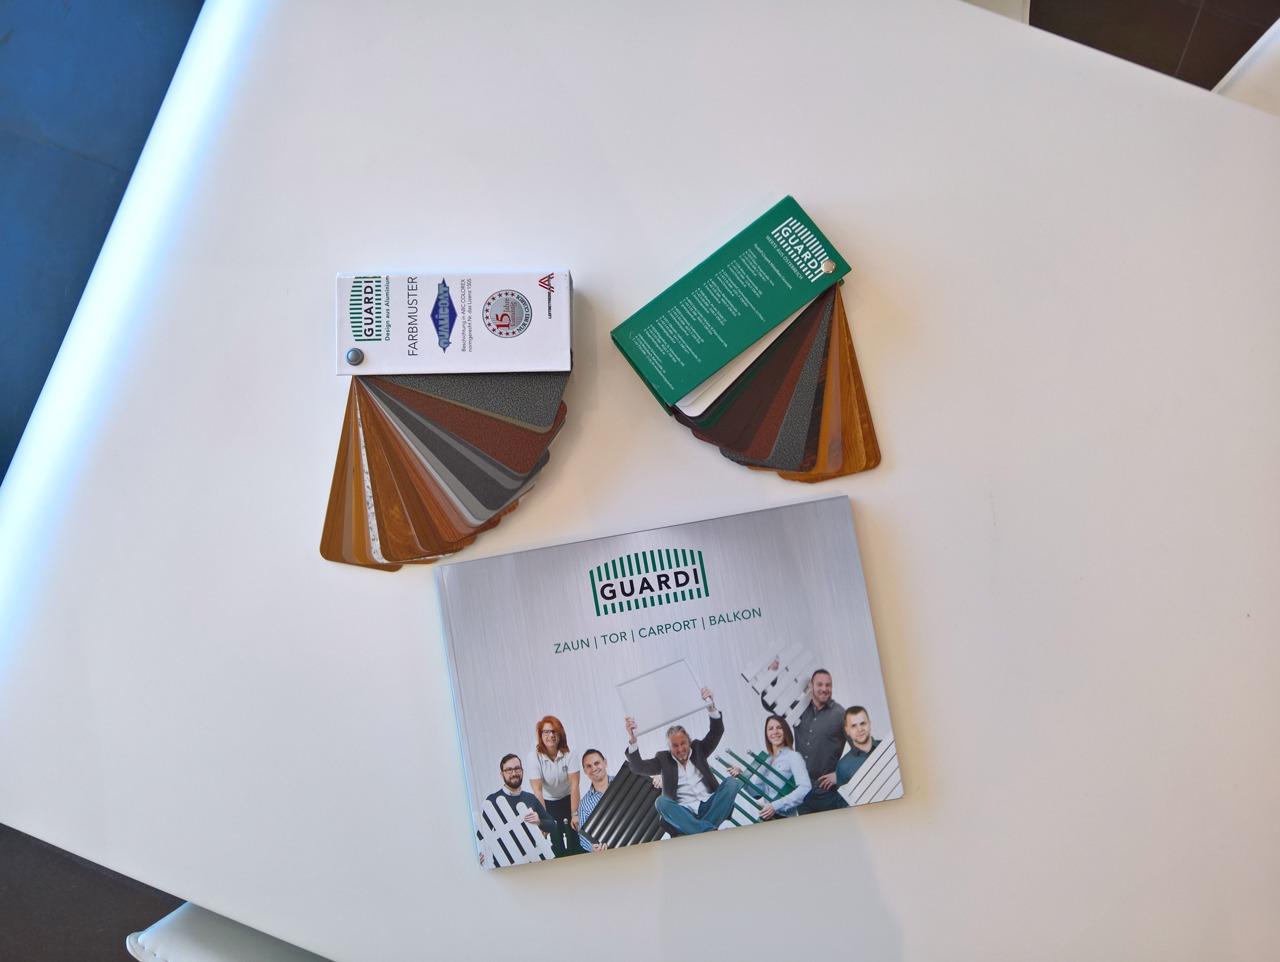 GUARDI Farben Alu Lacke Lackierung Design